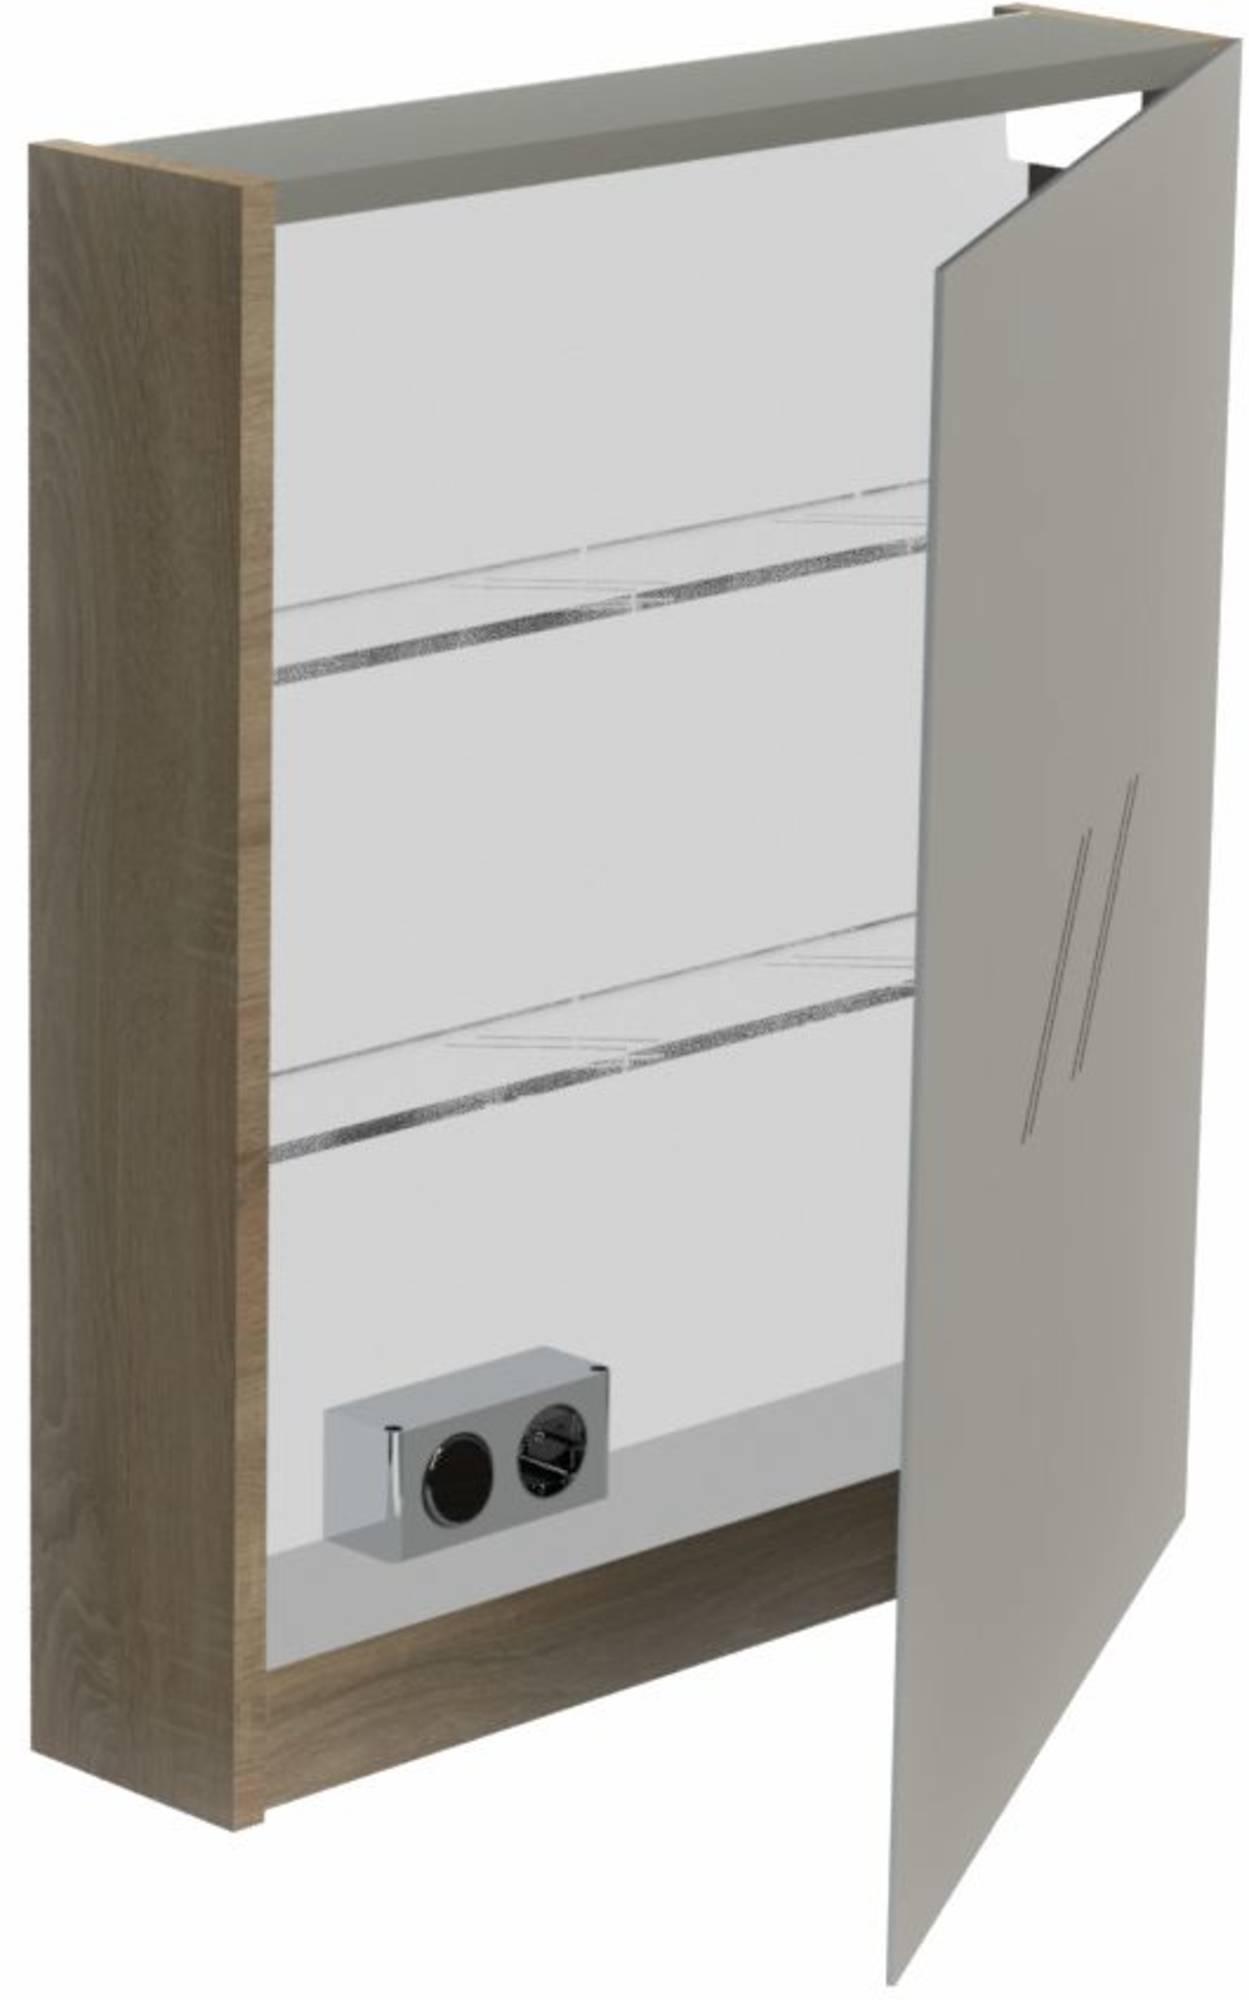 Thebalux Basic Spiegelkast rechtsdraaiend 70x60x13,5 cm Antraciet Mat